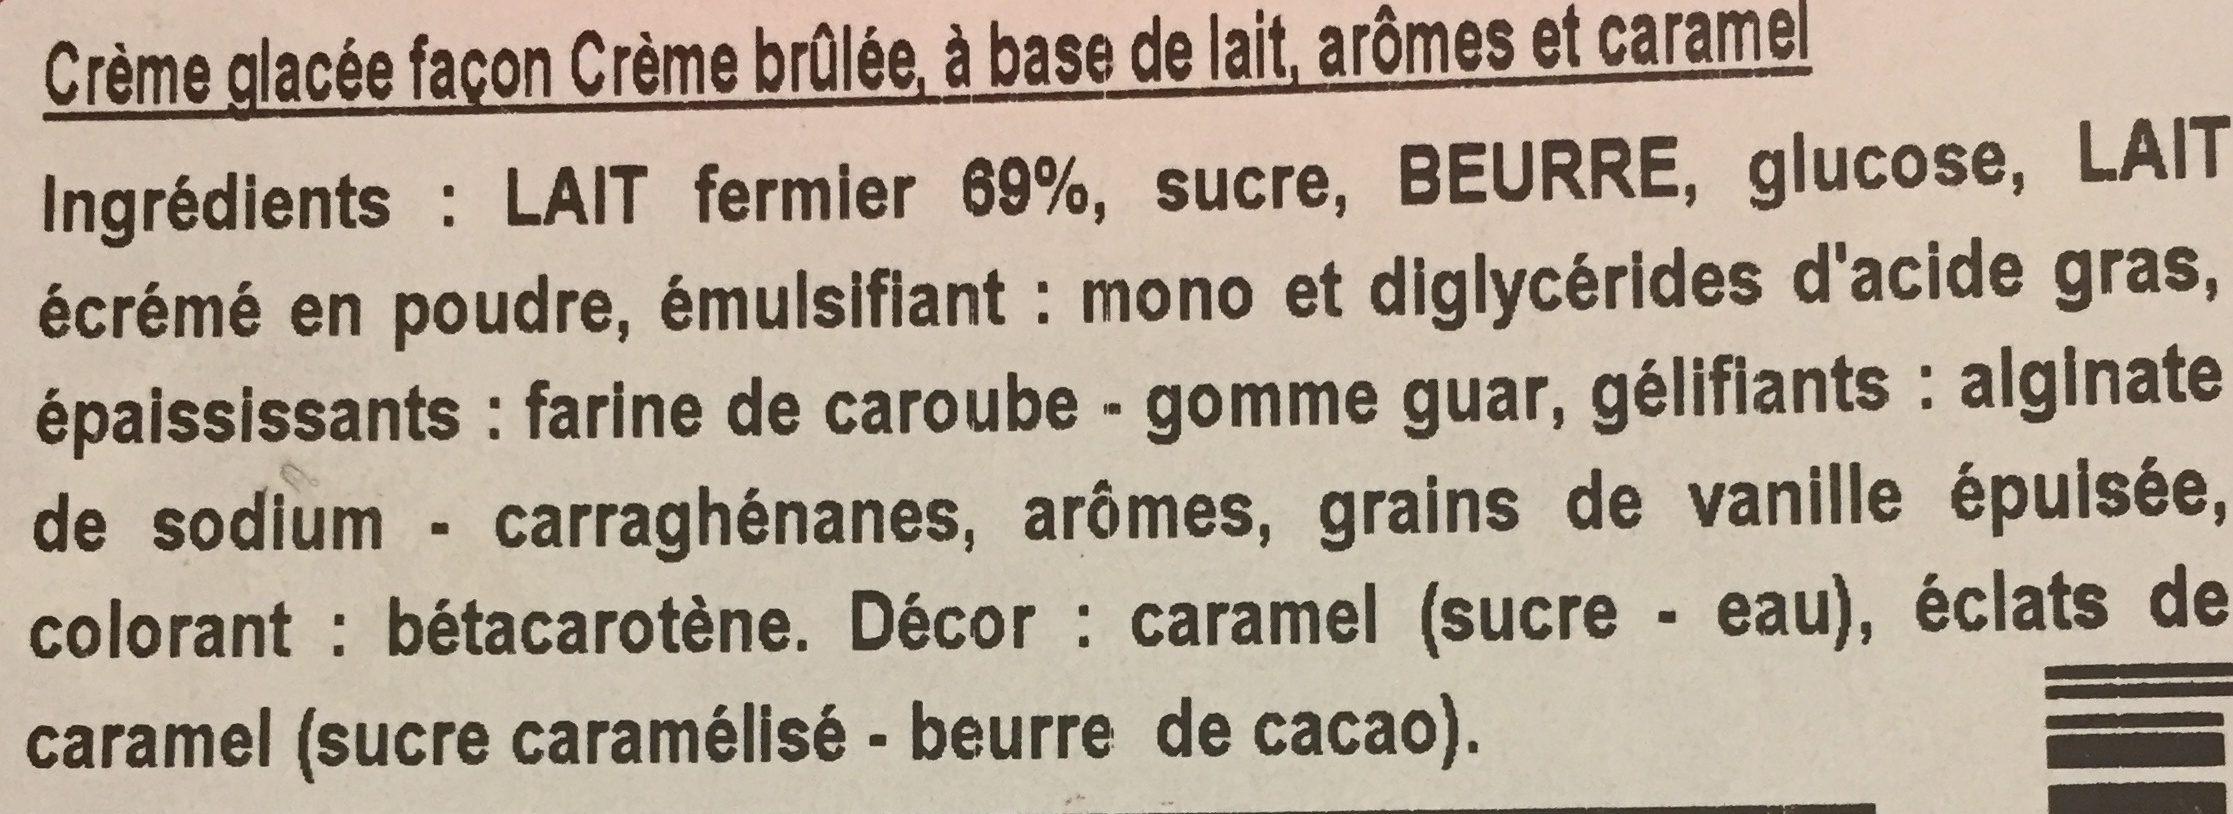 Glace creme brullee - Ingrédients